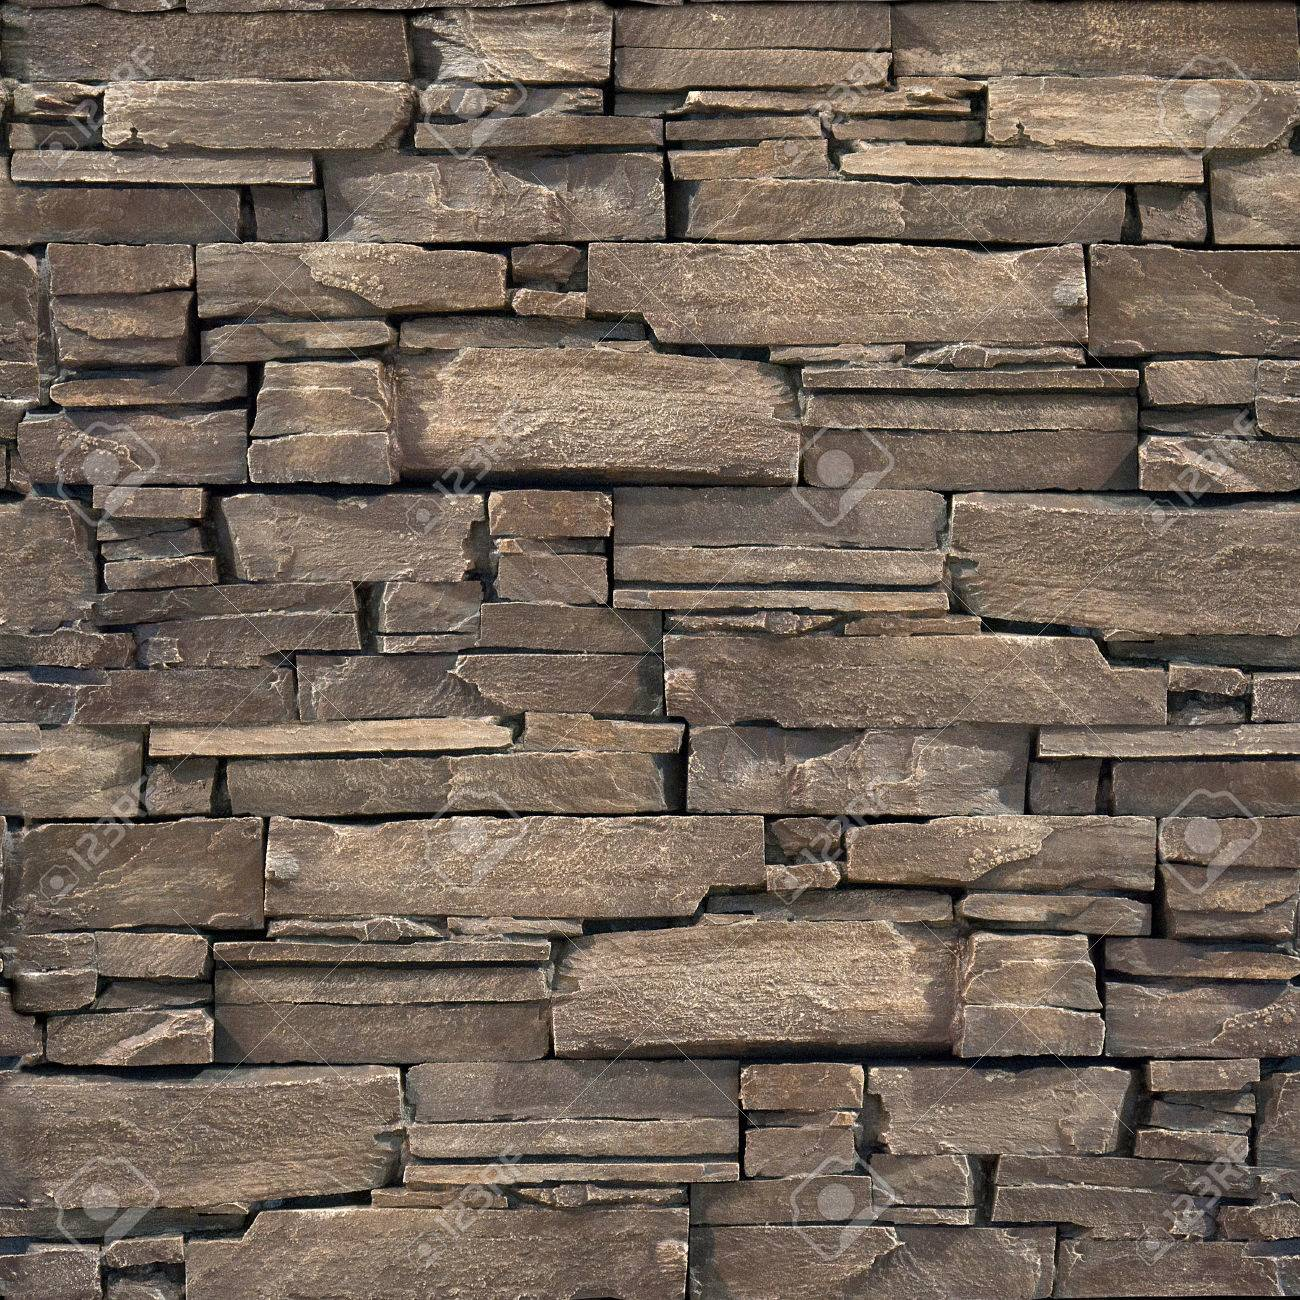 Decorative Stone Wall decorative stone wall - seamless background - stone texture stock